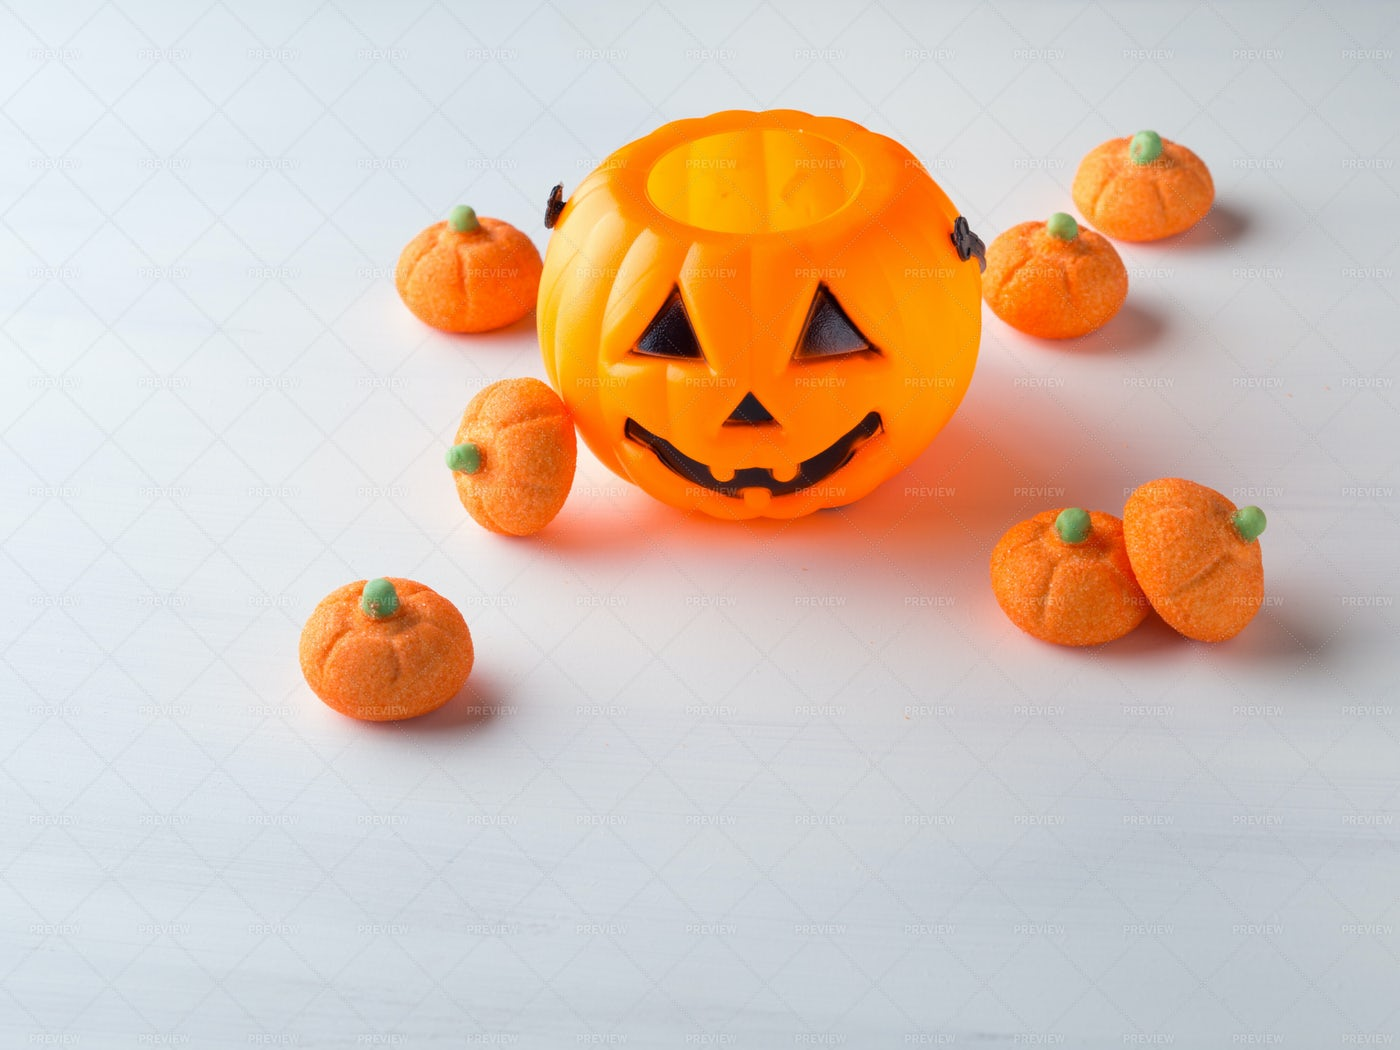 Pumpkin With Marshmallows: Stock Photos